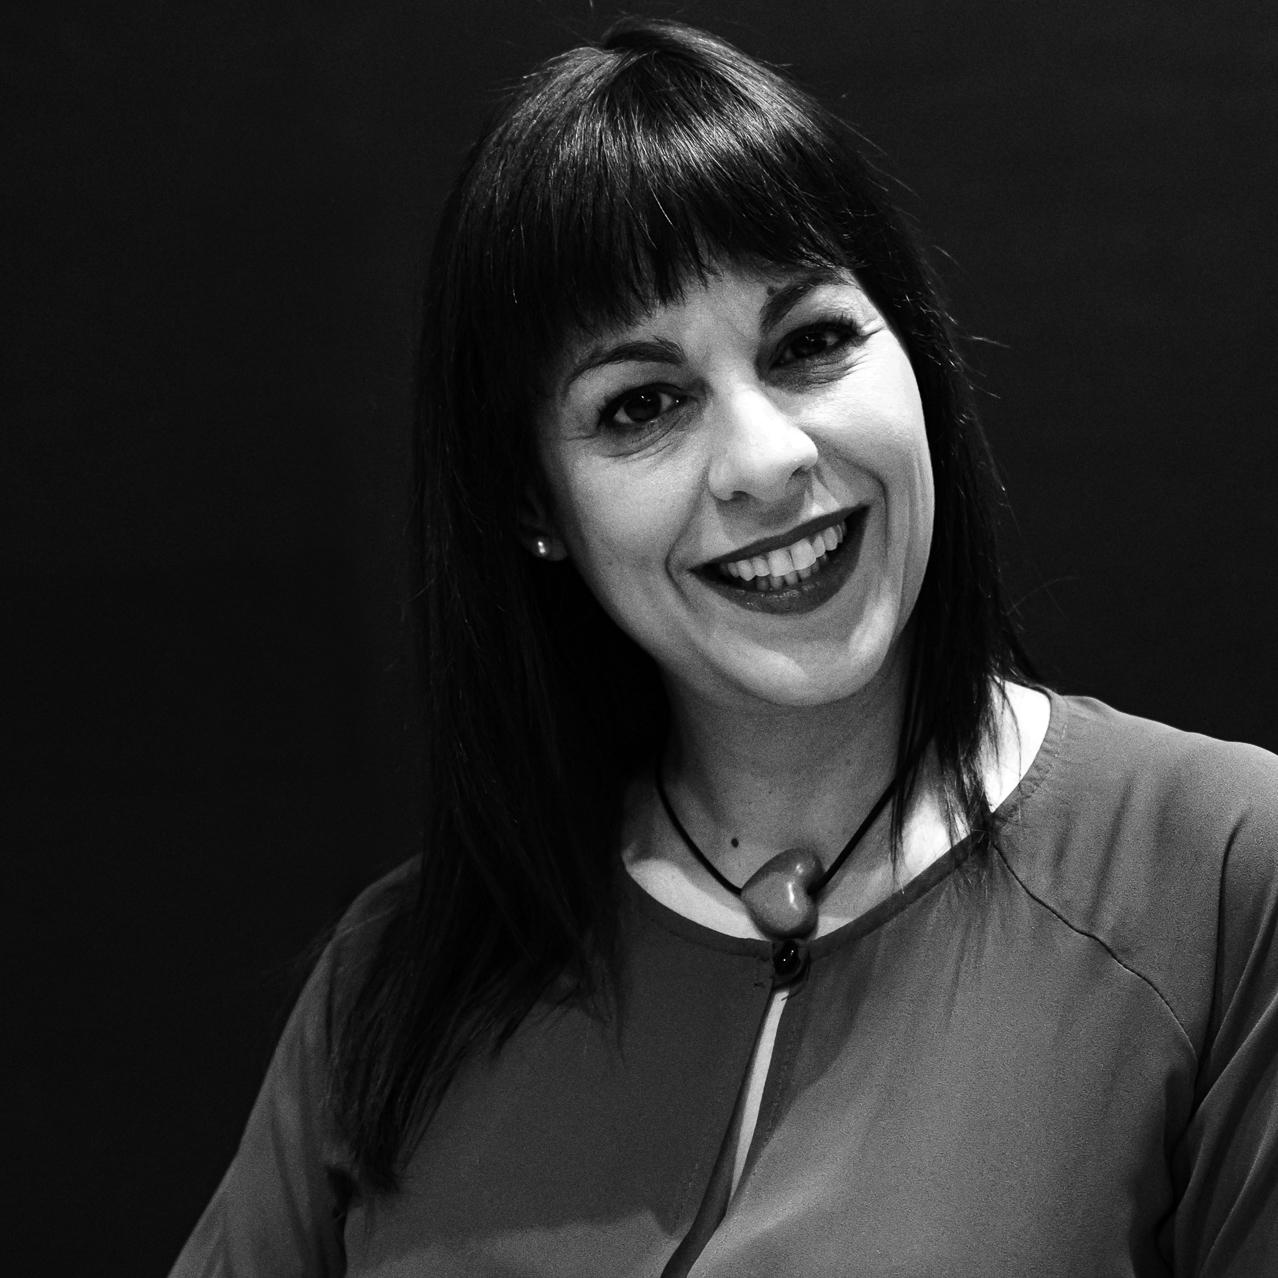 Barbara Mulas